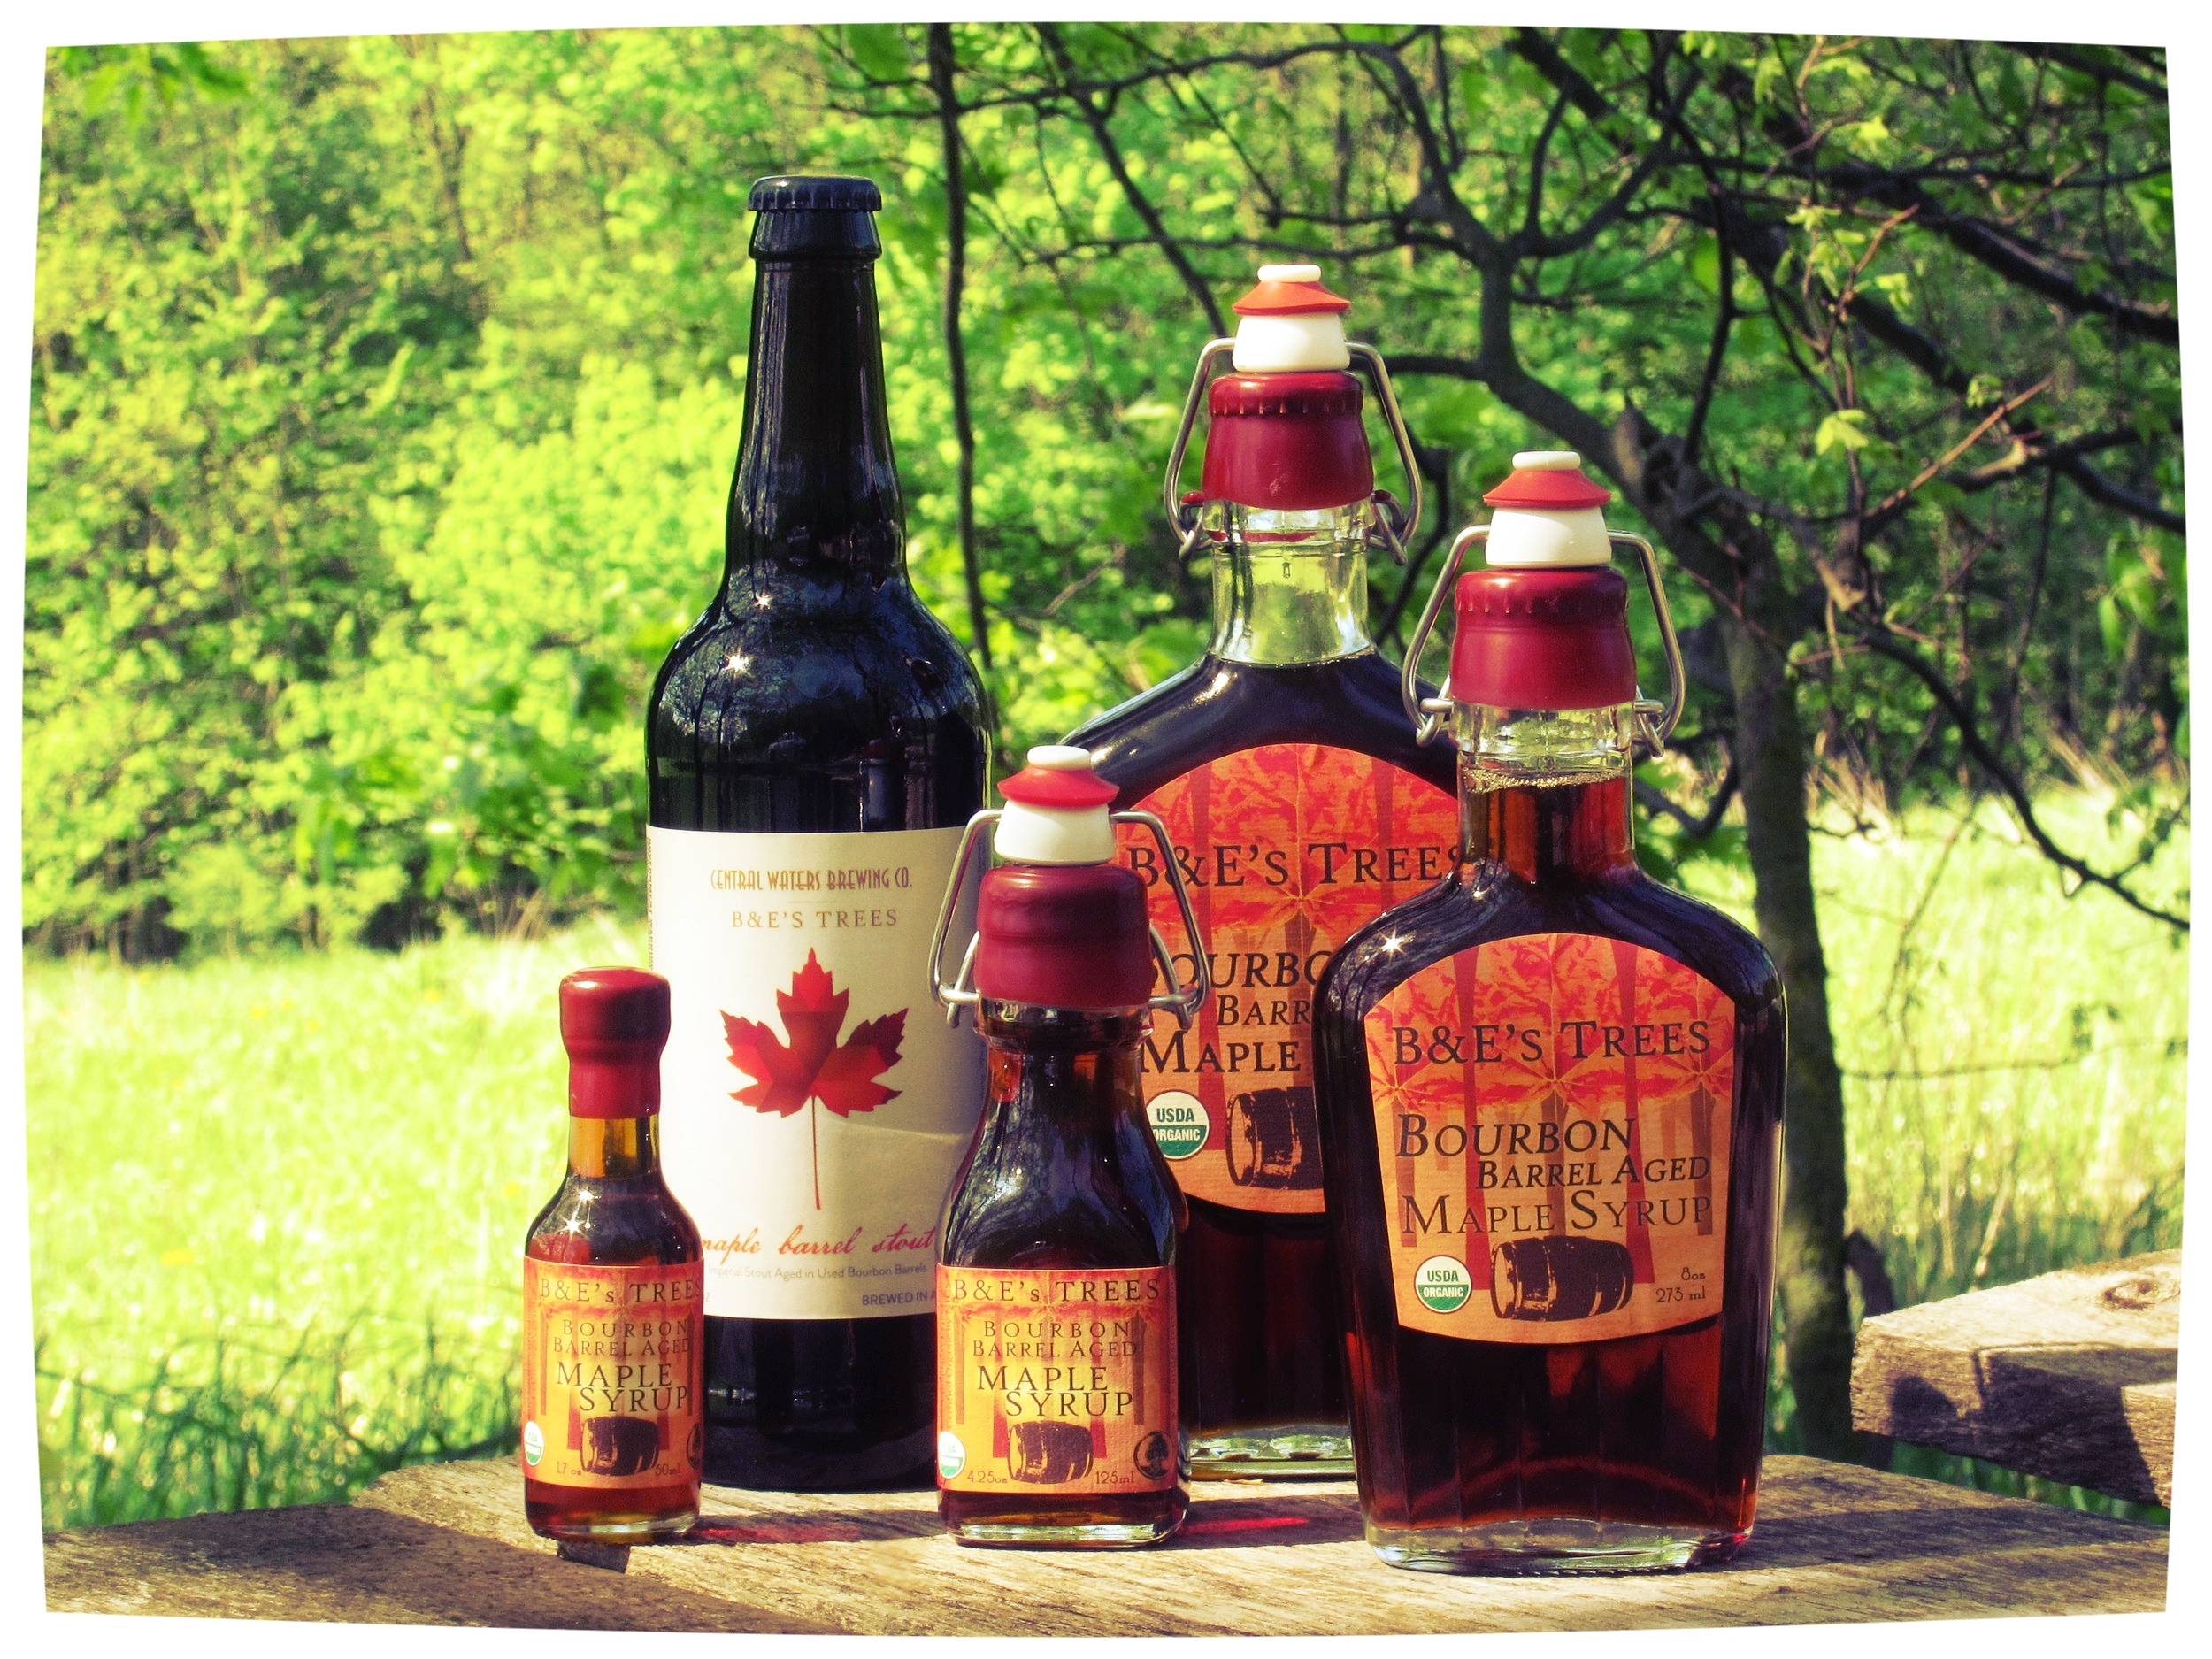 Bourbon Barrel Aged Maple Syrup!